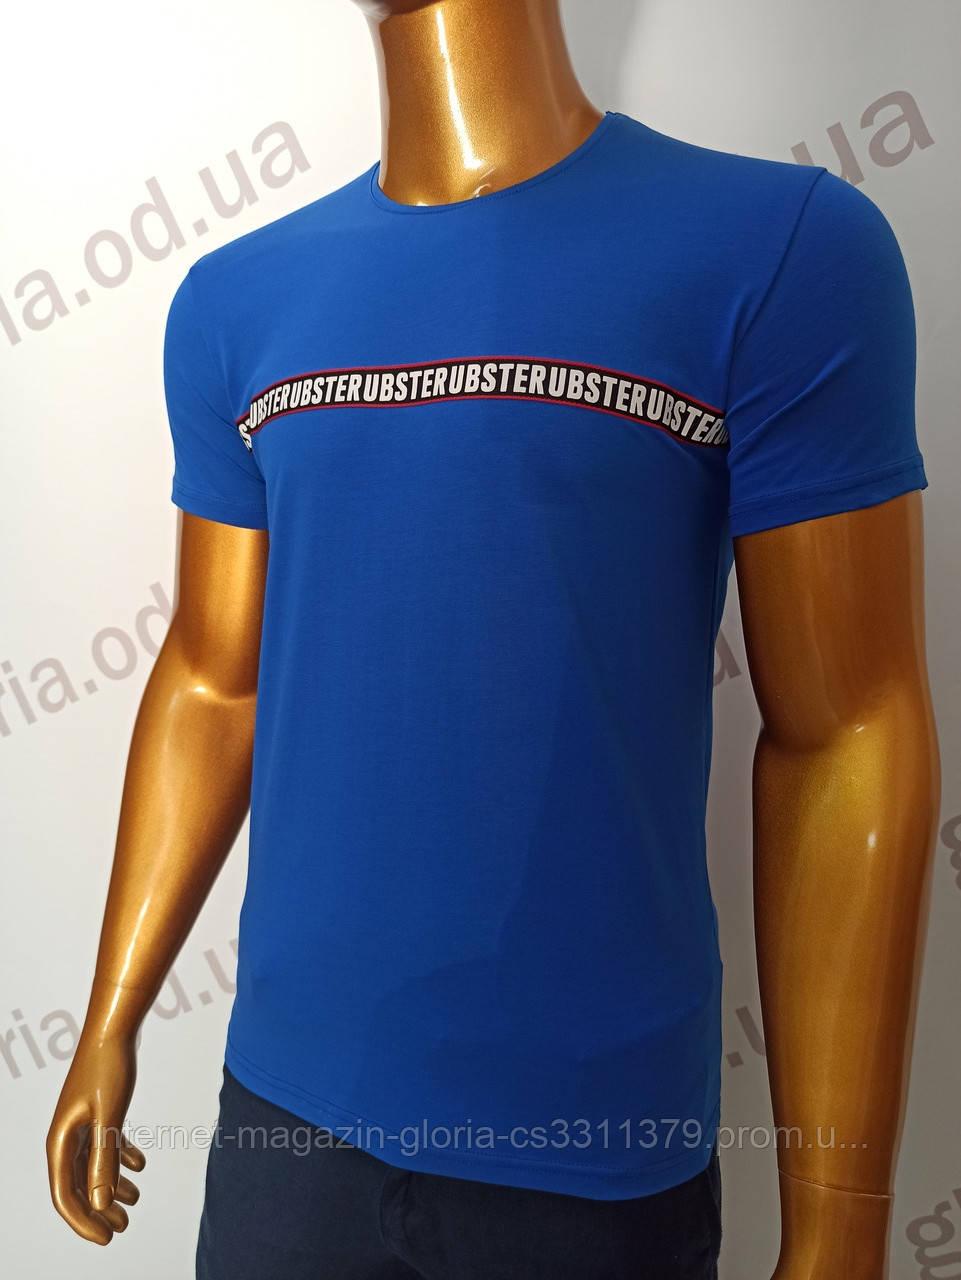 Мужская футболка MSY. 42668-8343(si). Размеры: M,L,XL,XXL.